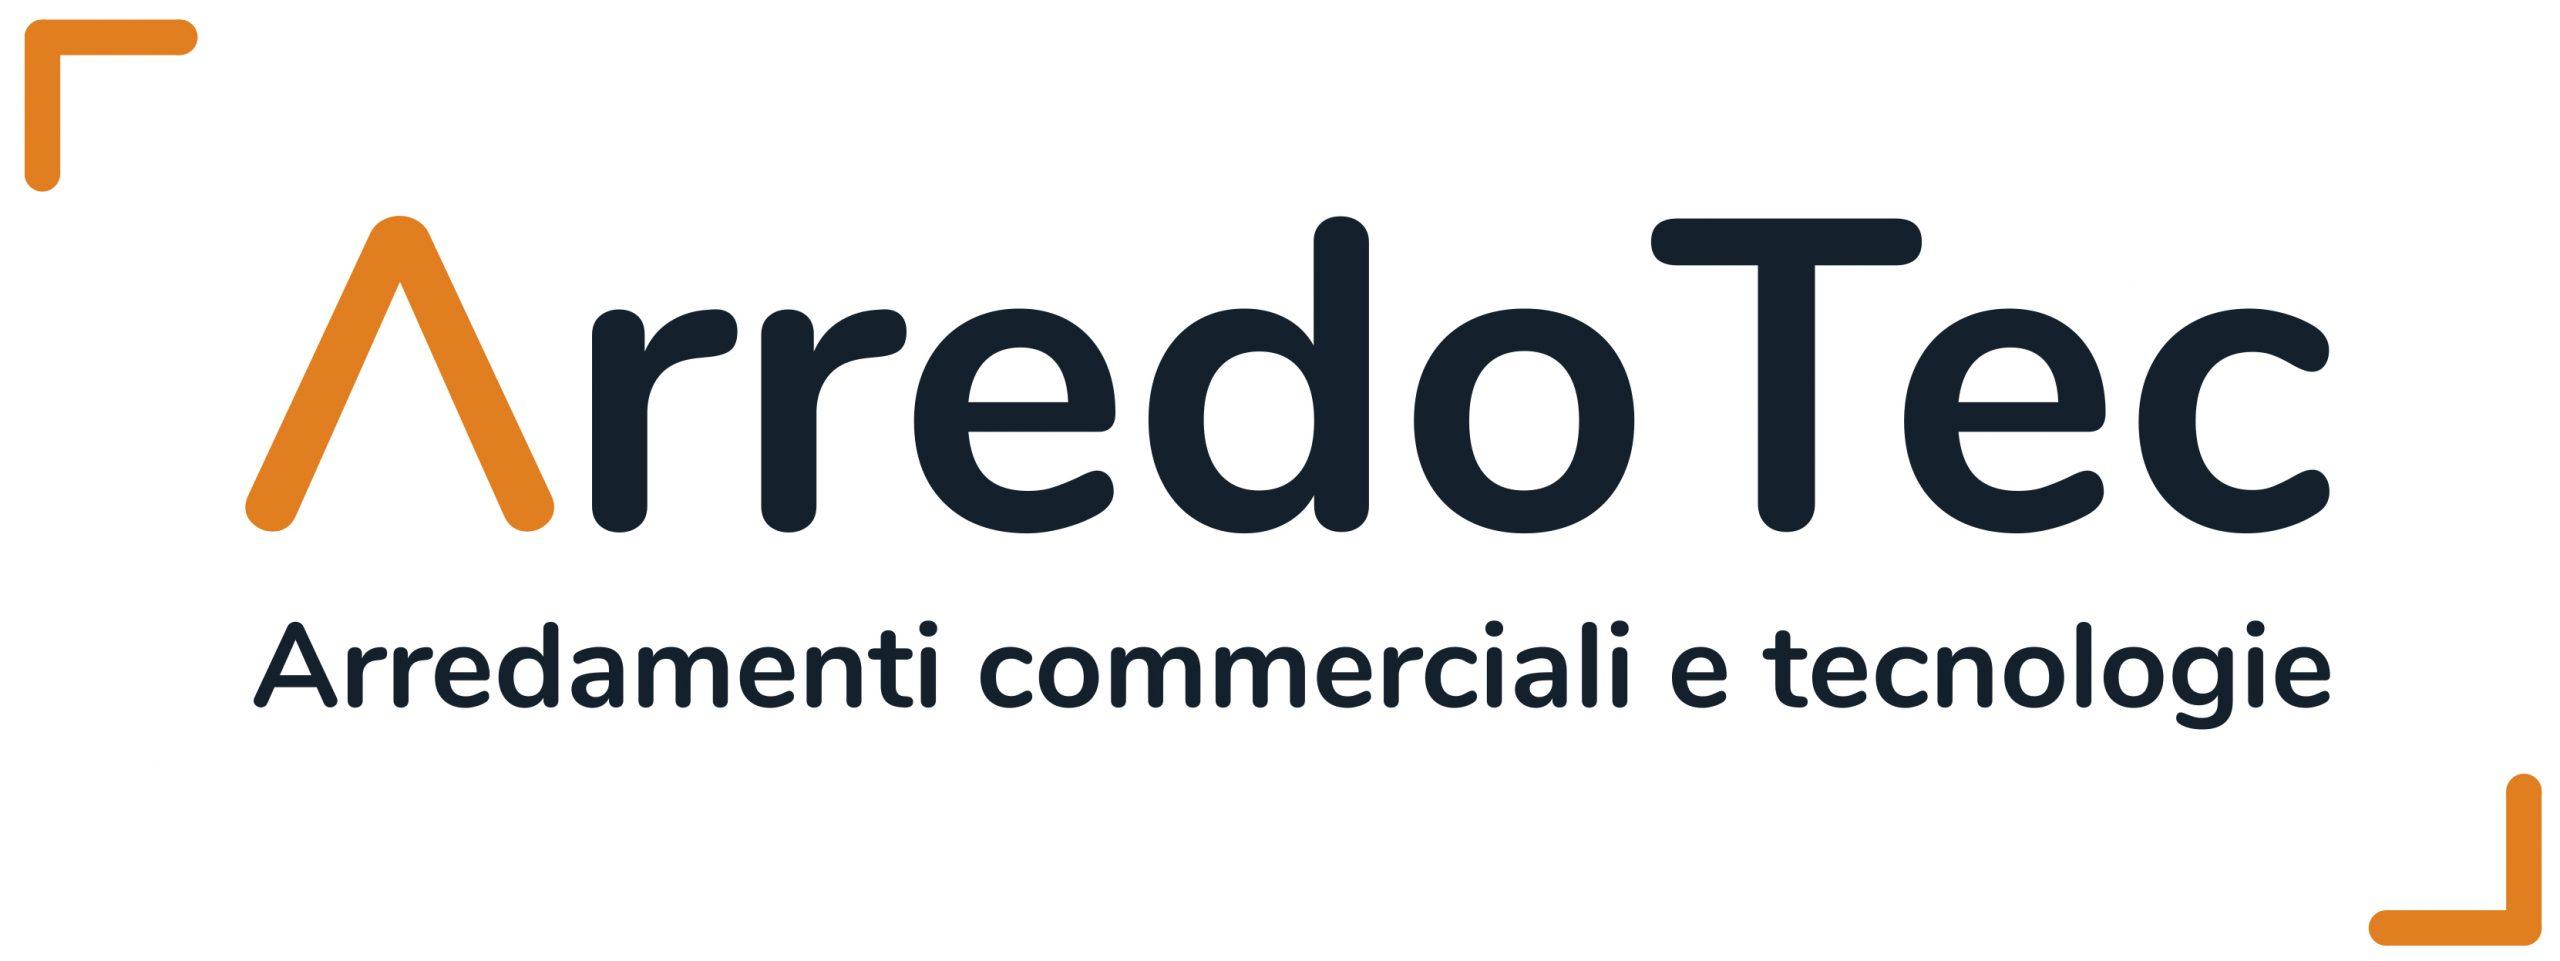 Arredotec_MARCHIO 1